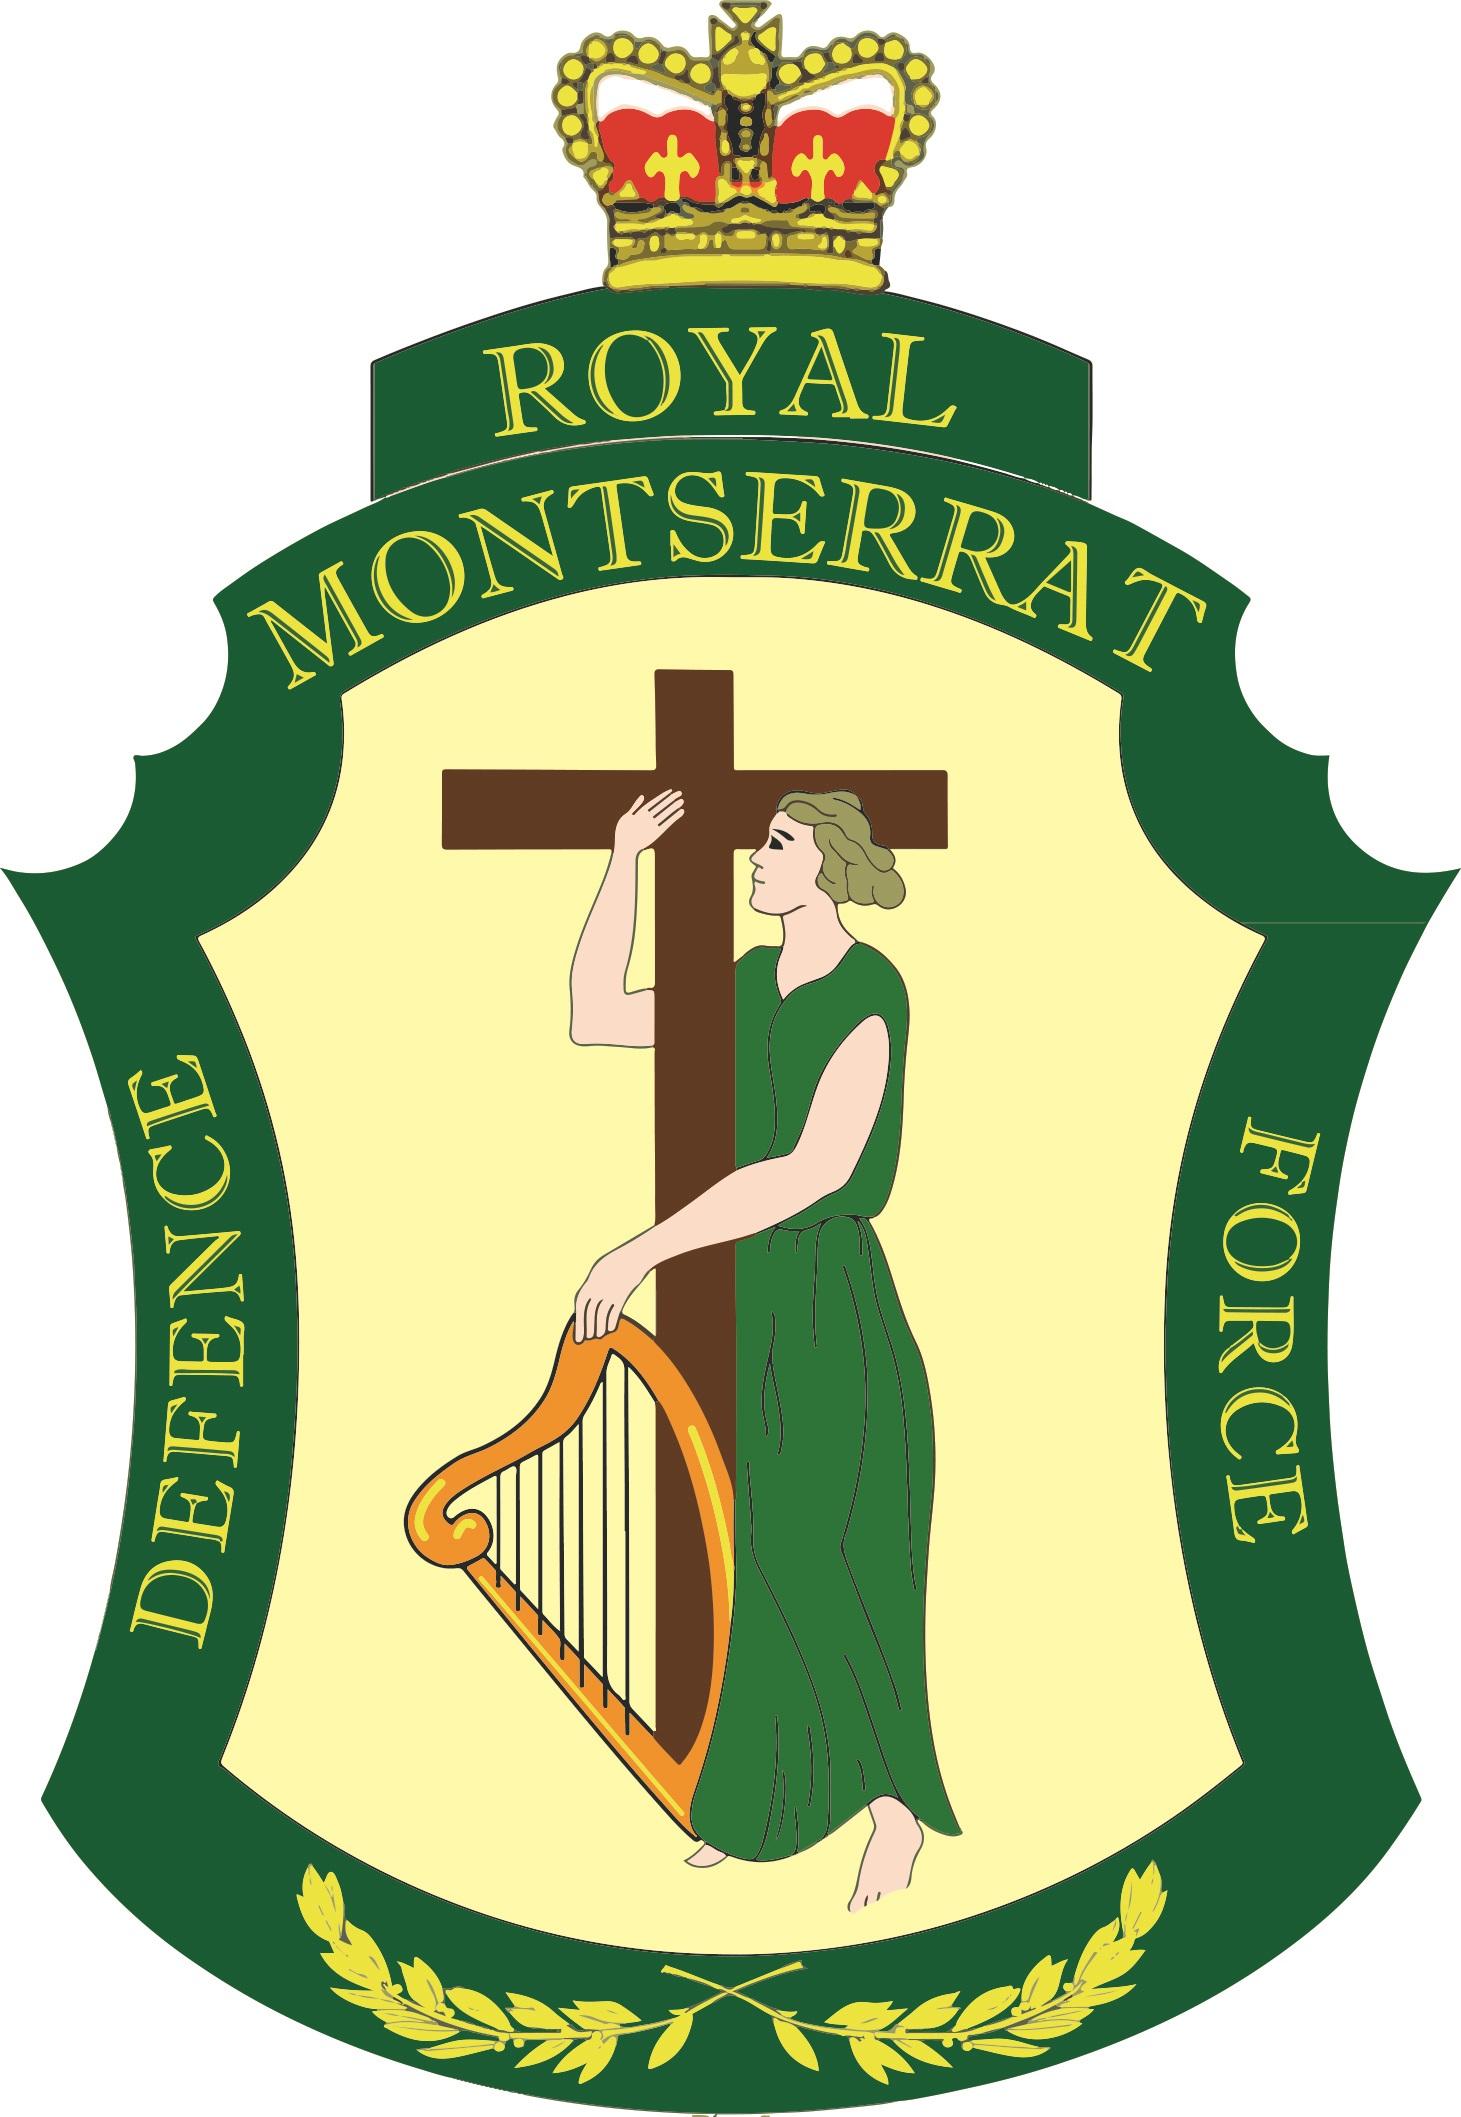 Royal Montserrat Defence Force.